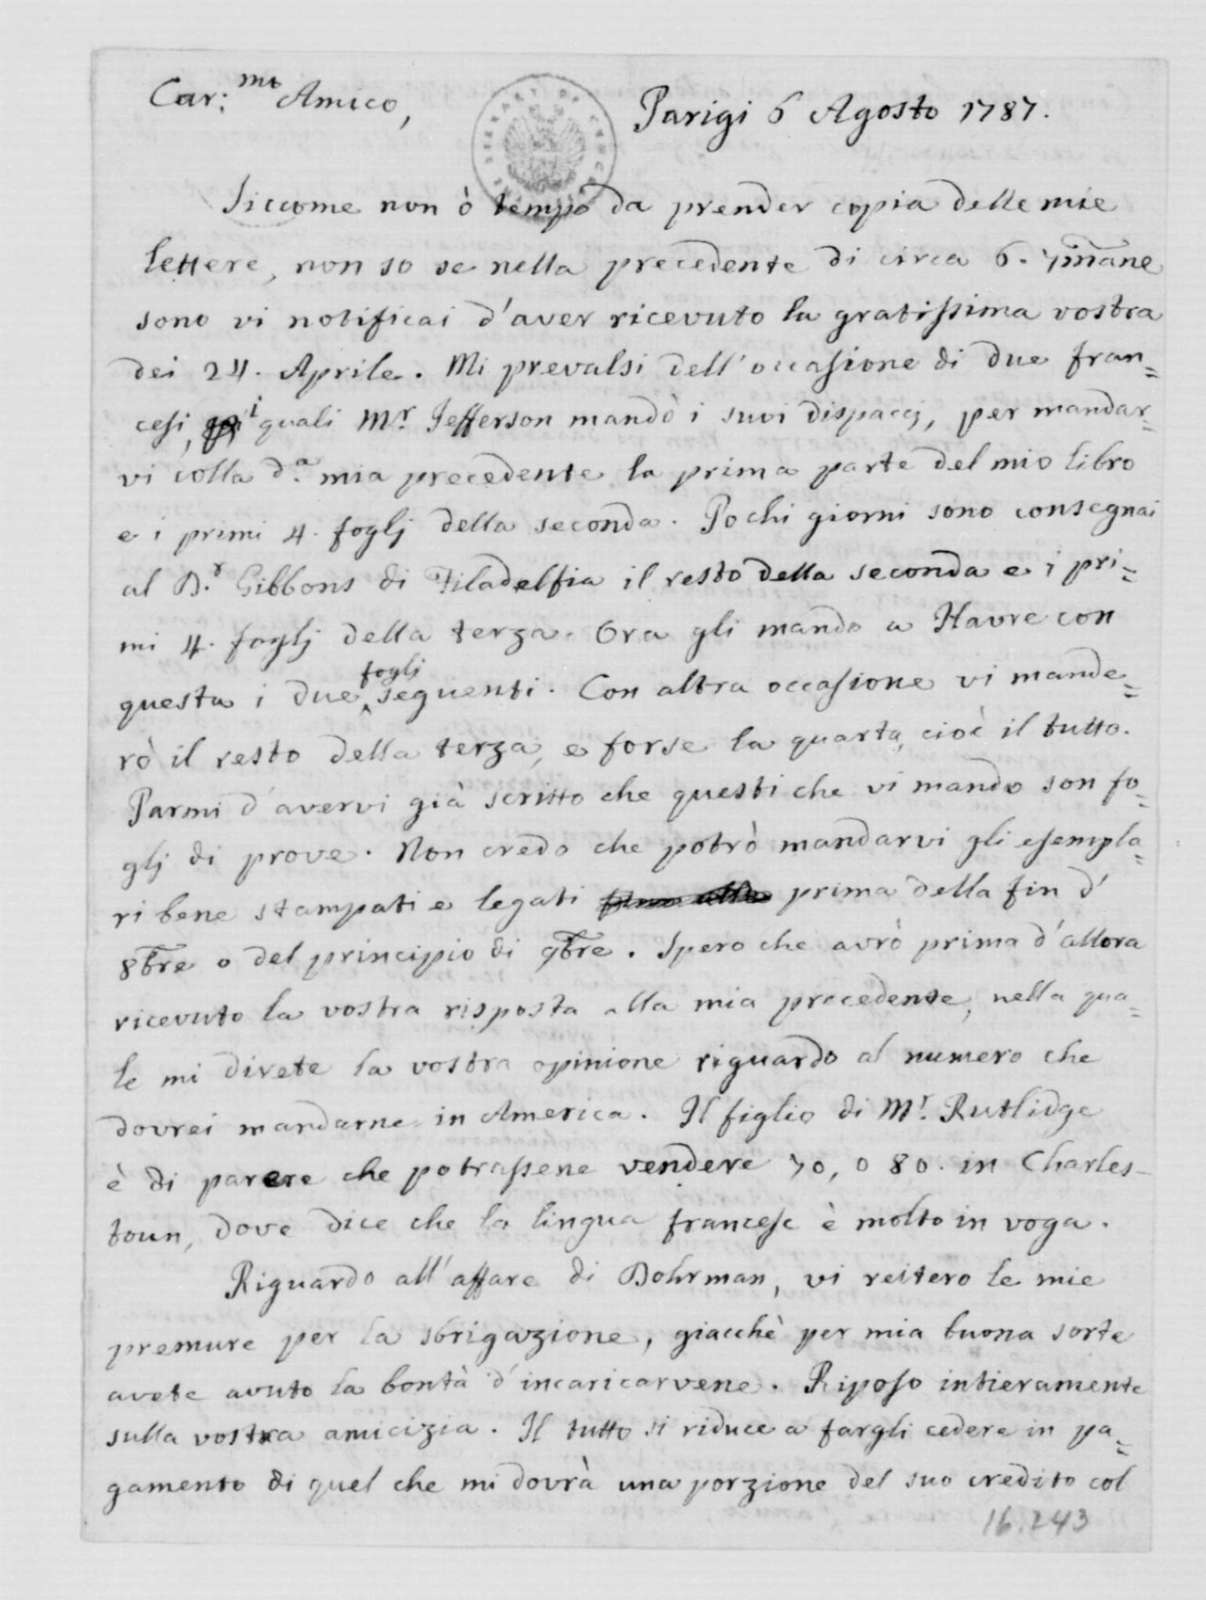 Philip Mazzei to James Madison, August 6, 1787. In Italian.